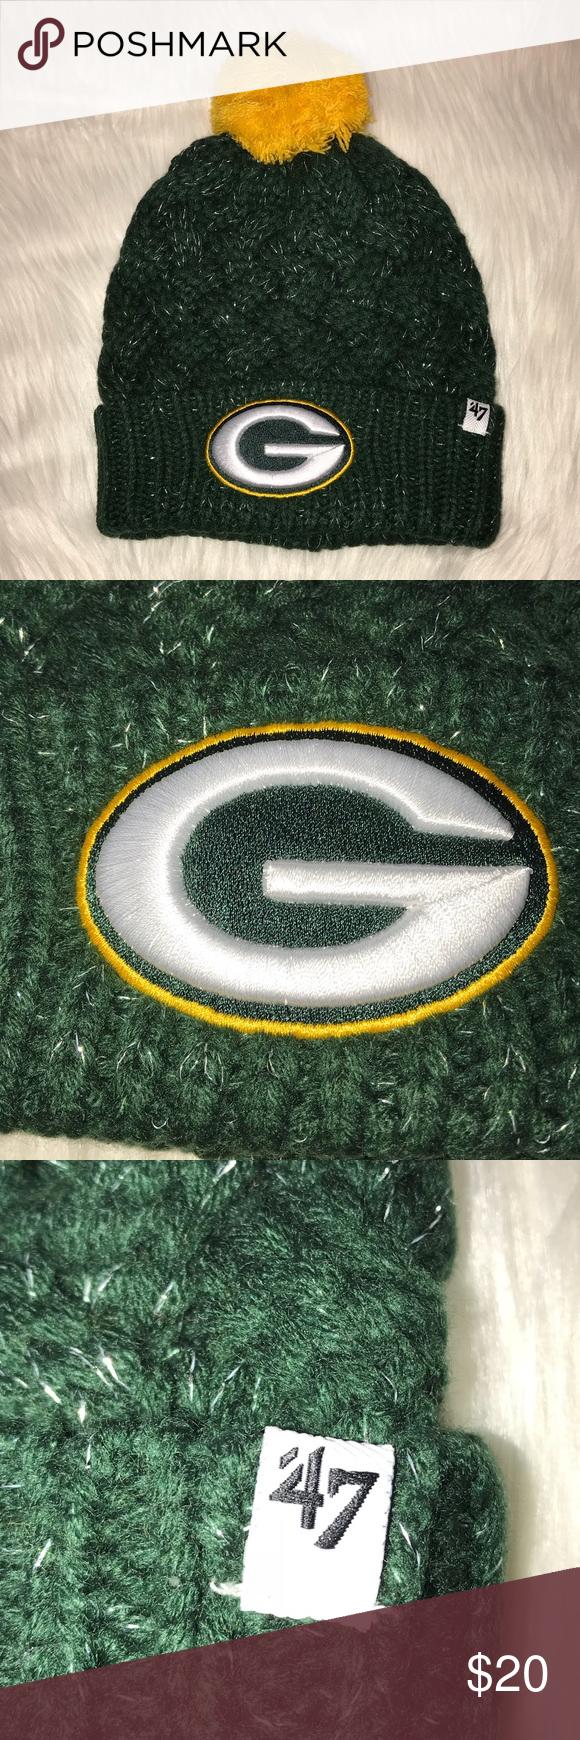 Womens Nfl Green Bay Packers Pom Pom Sock Hat Nwt Nfl Accessories Logo Knit Green Hats